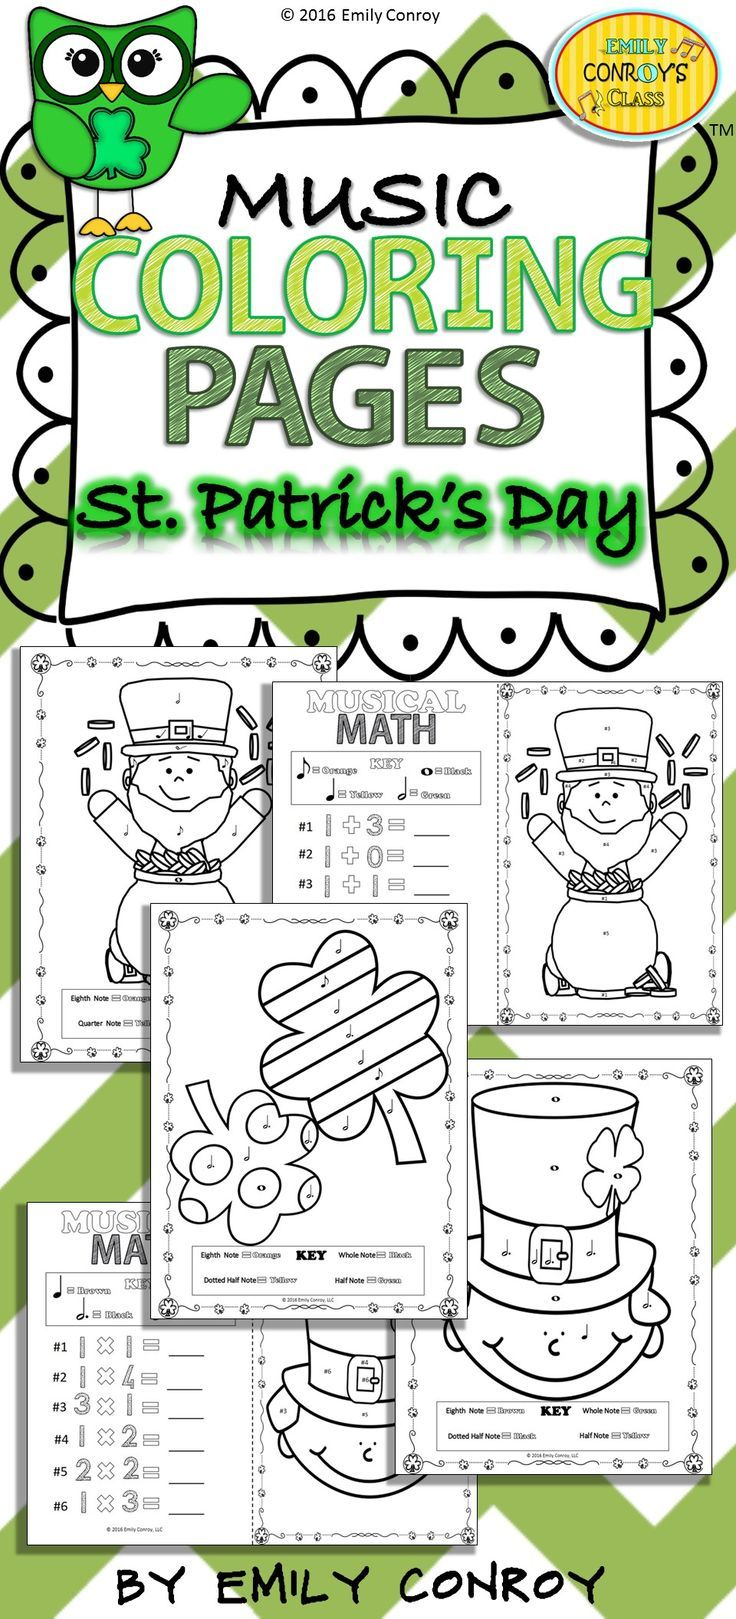 Excepcional Hola Gatito Páginas Para Colorear St Patricks Day ...